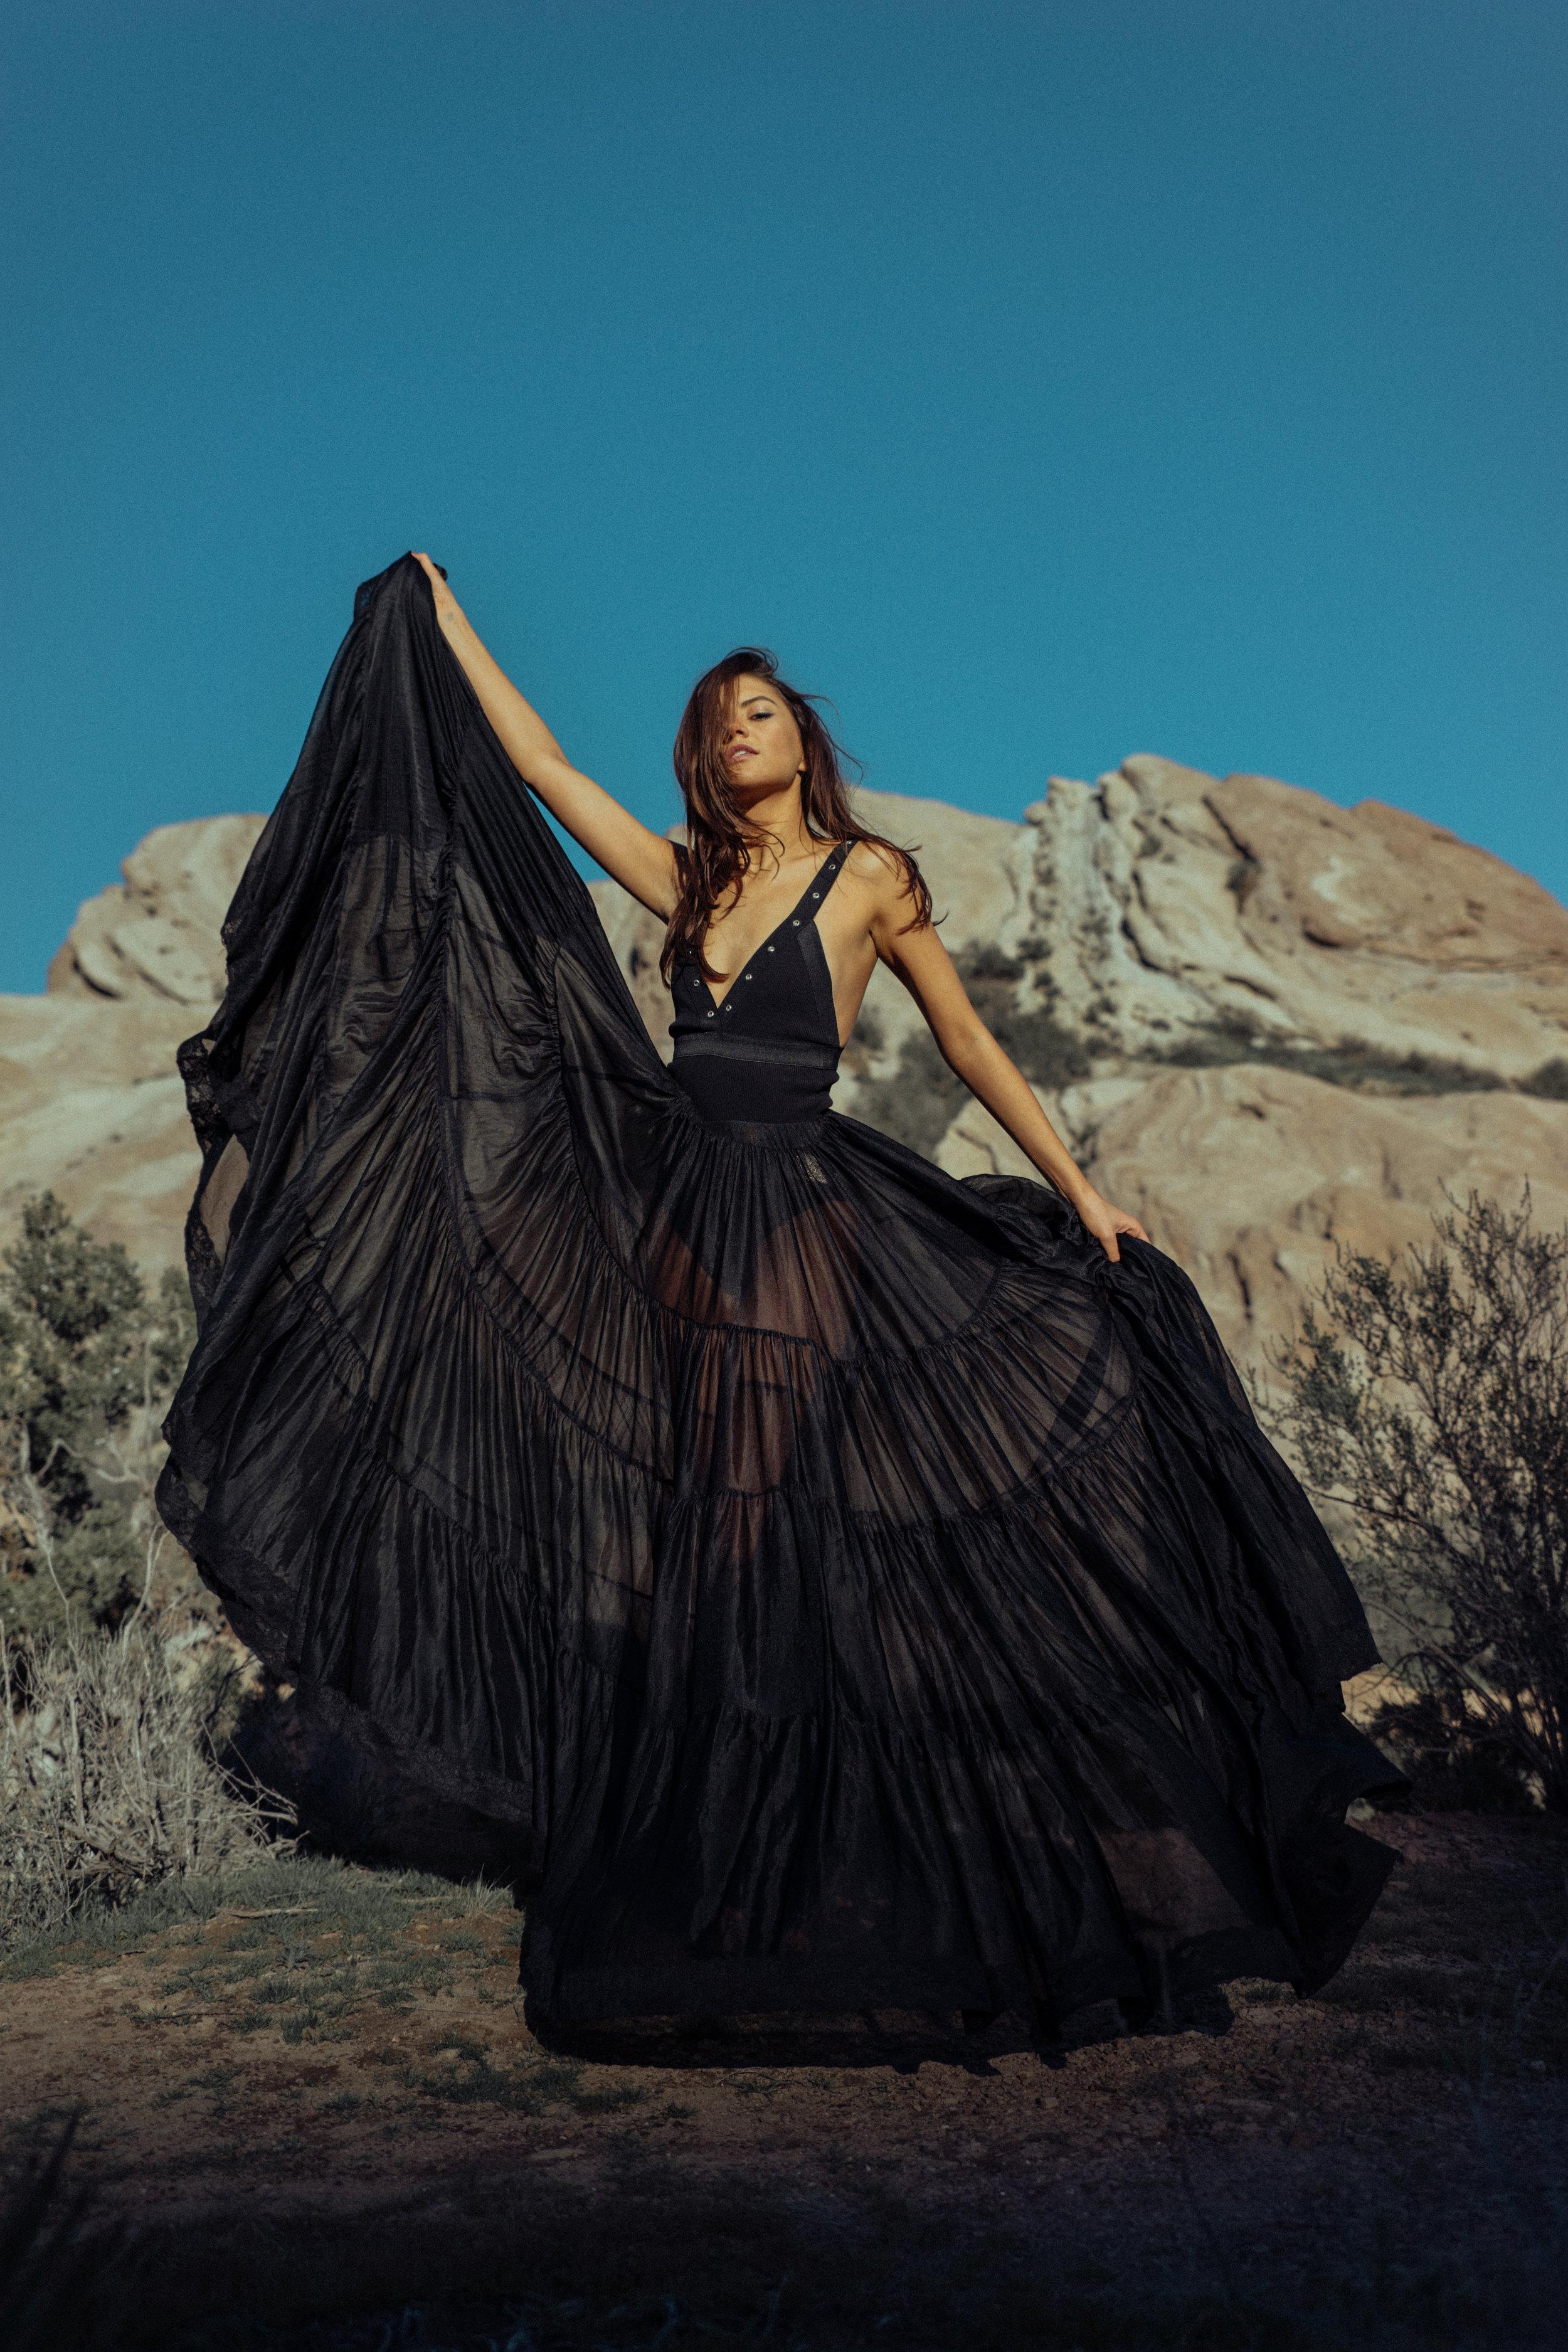 Joanna - Vasquez Rocks, CA